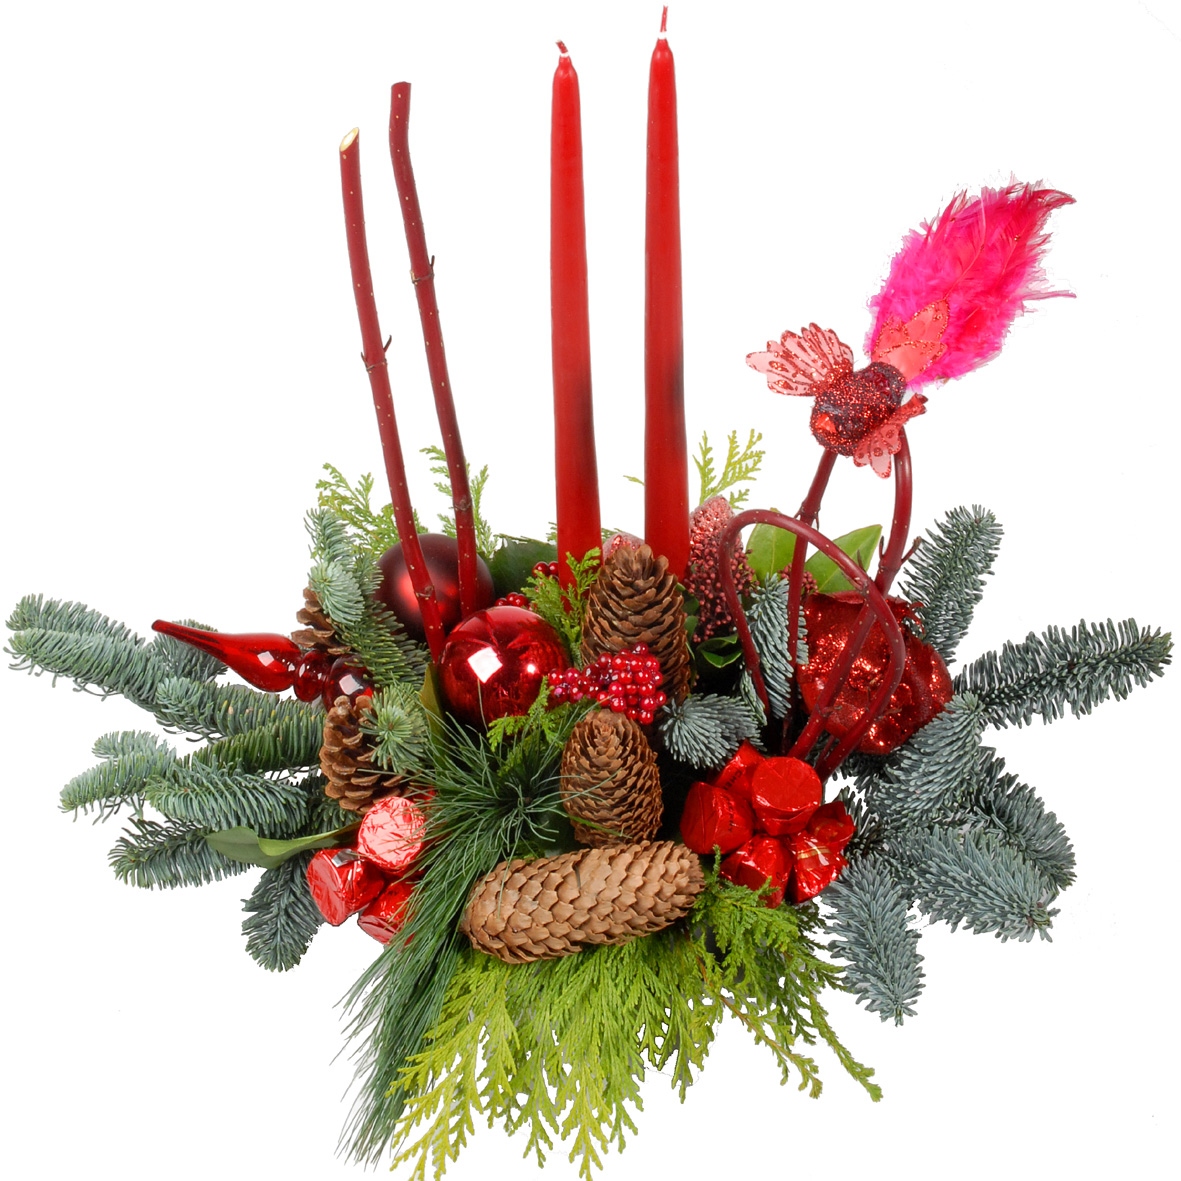 Kerststuk met kaarsen + kersenbonbons